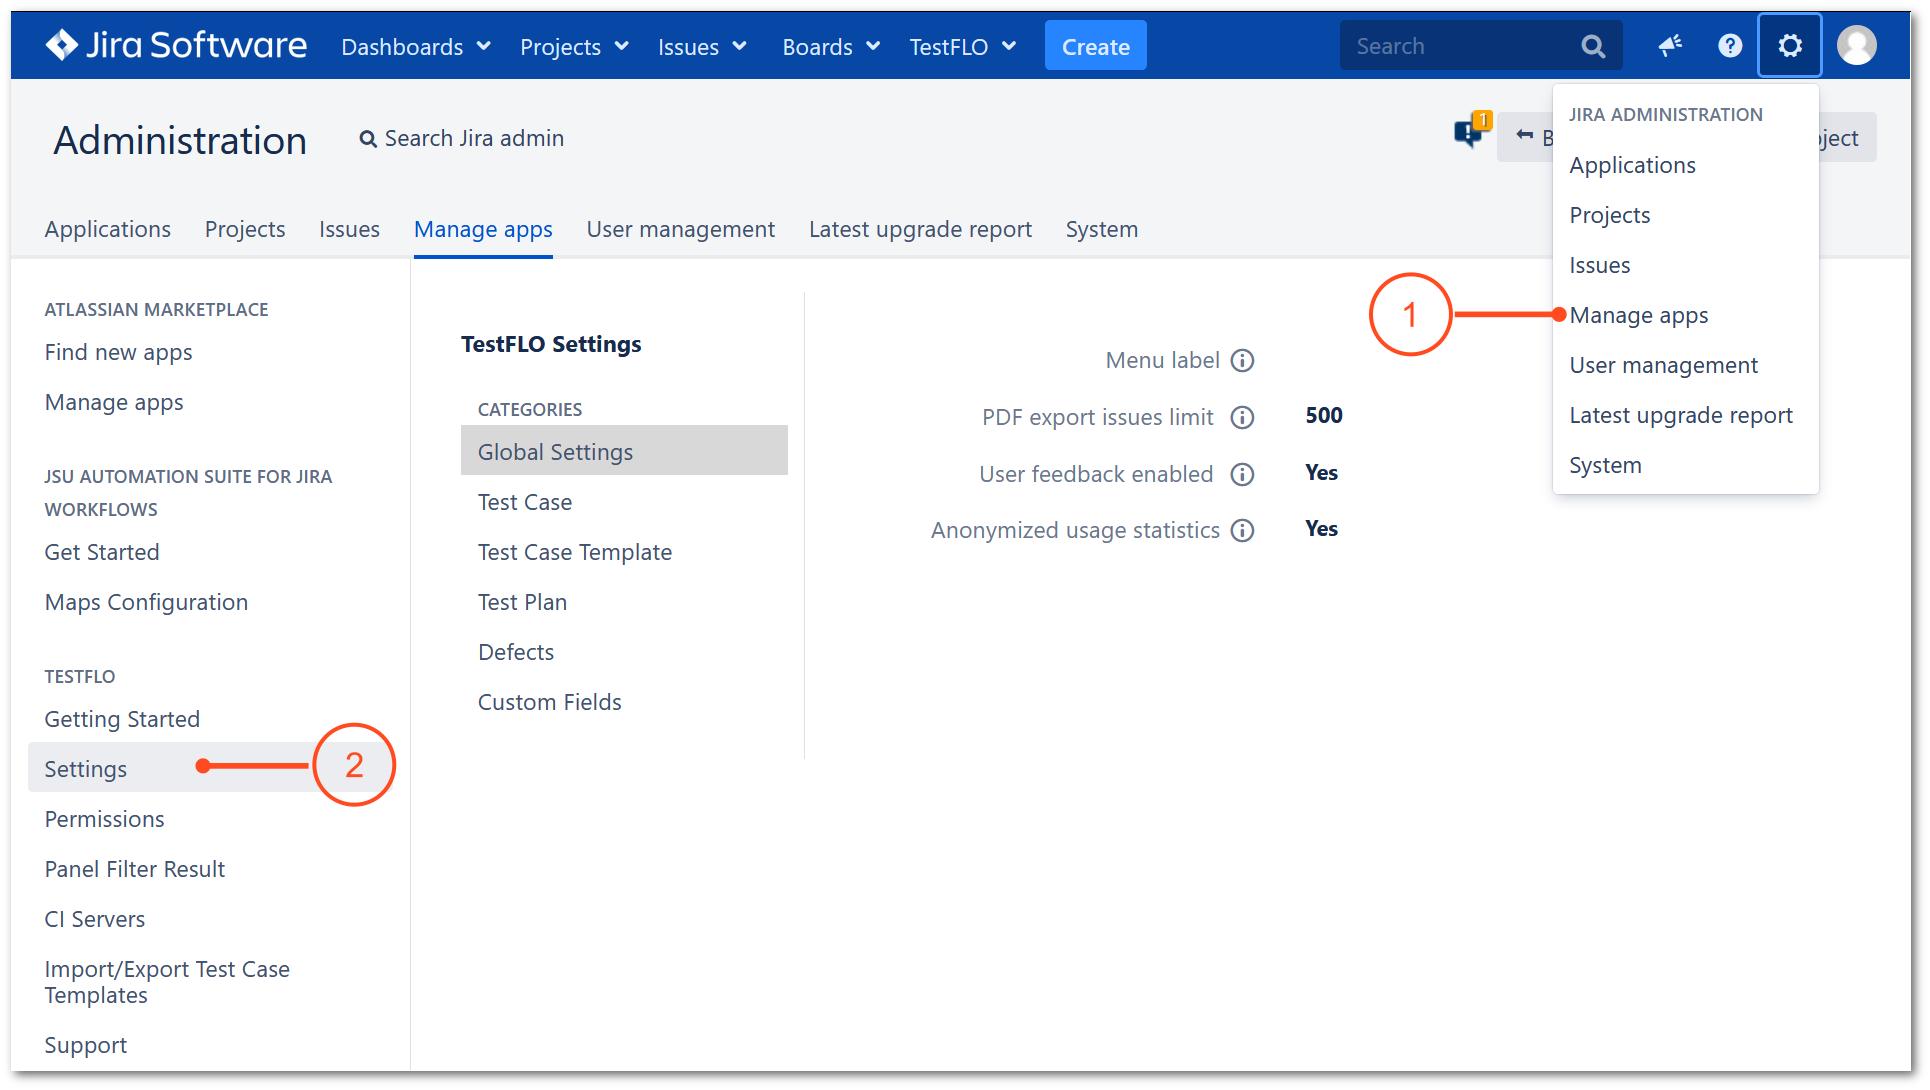 TestFLO settings